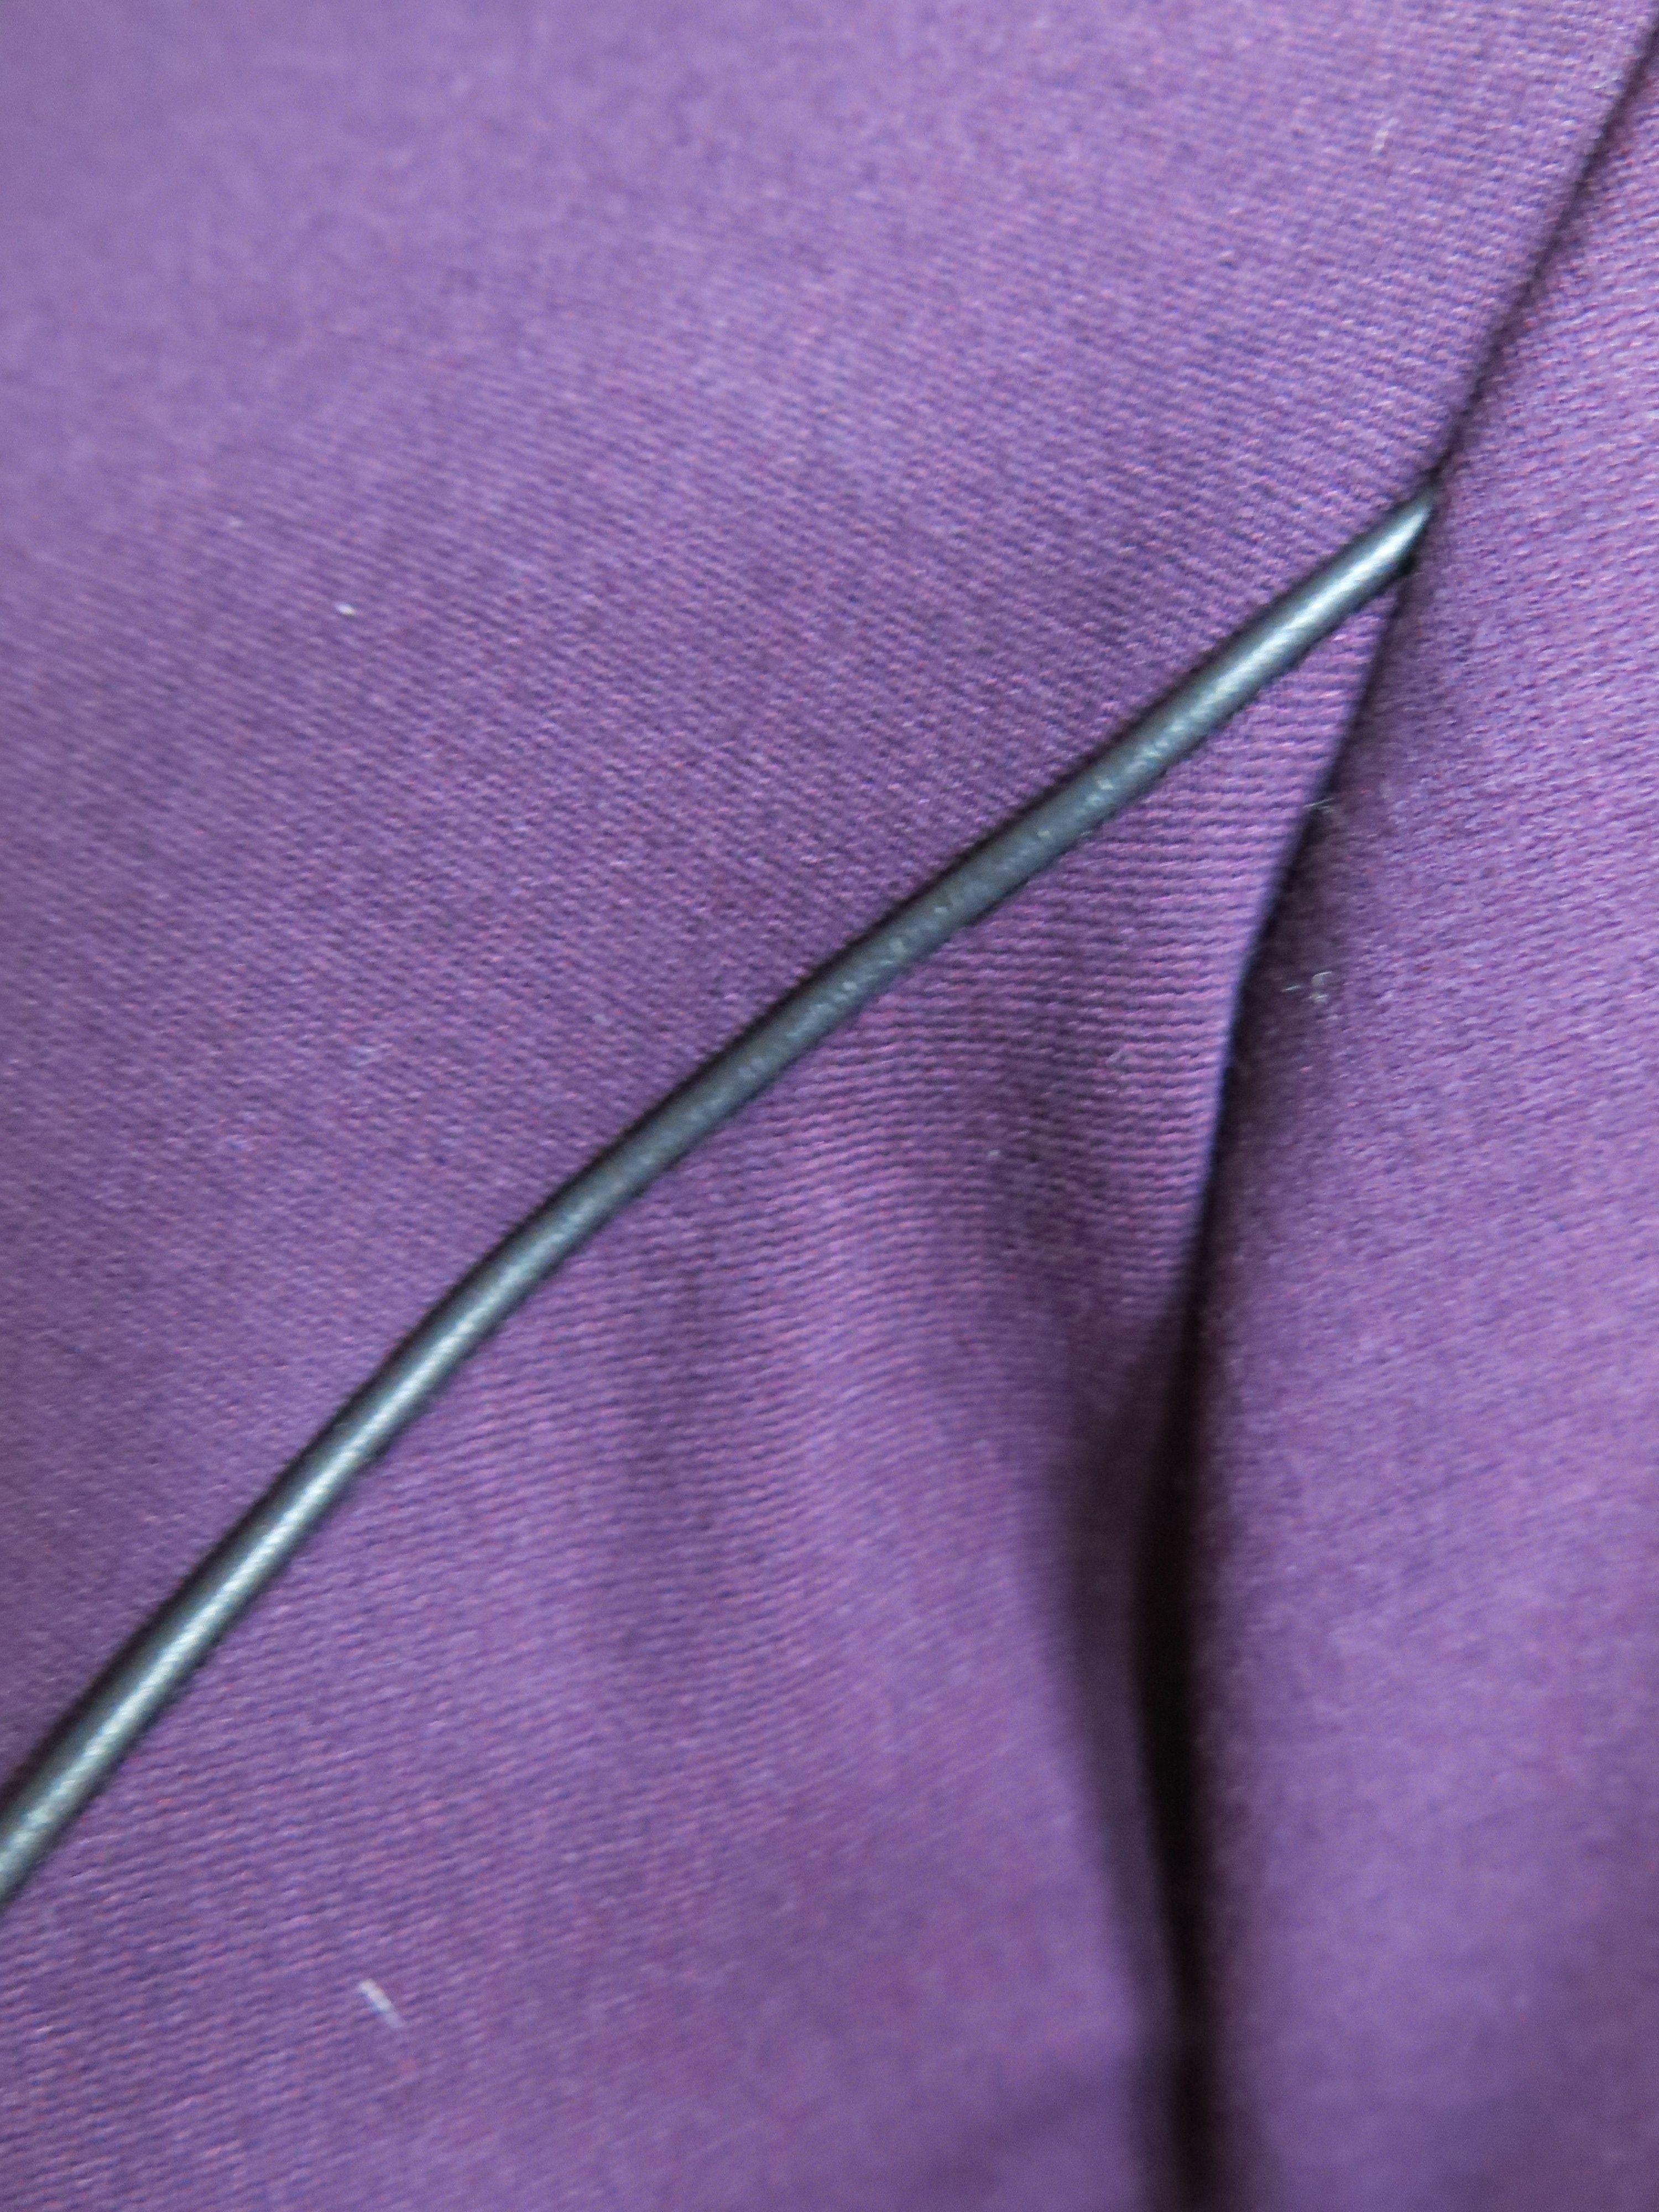 Lila Kleid Detail 3